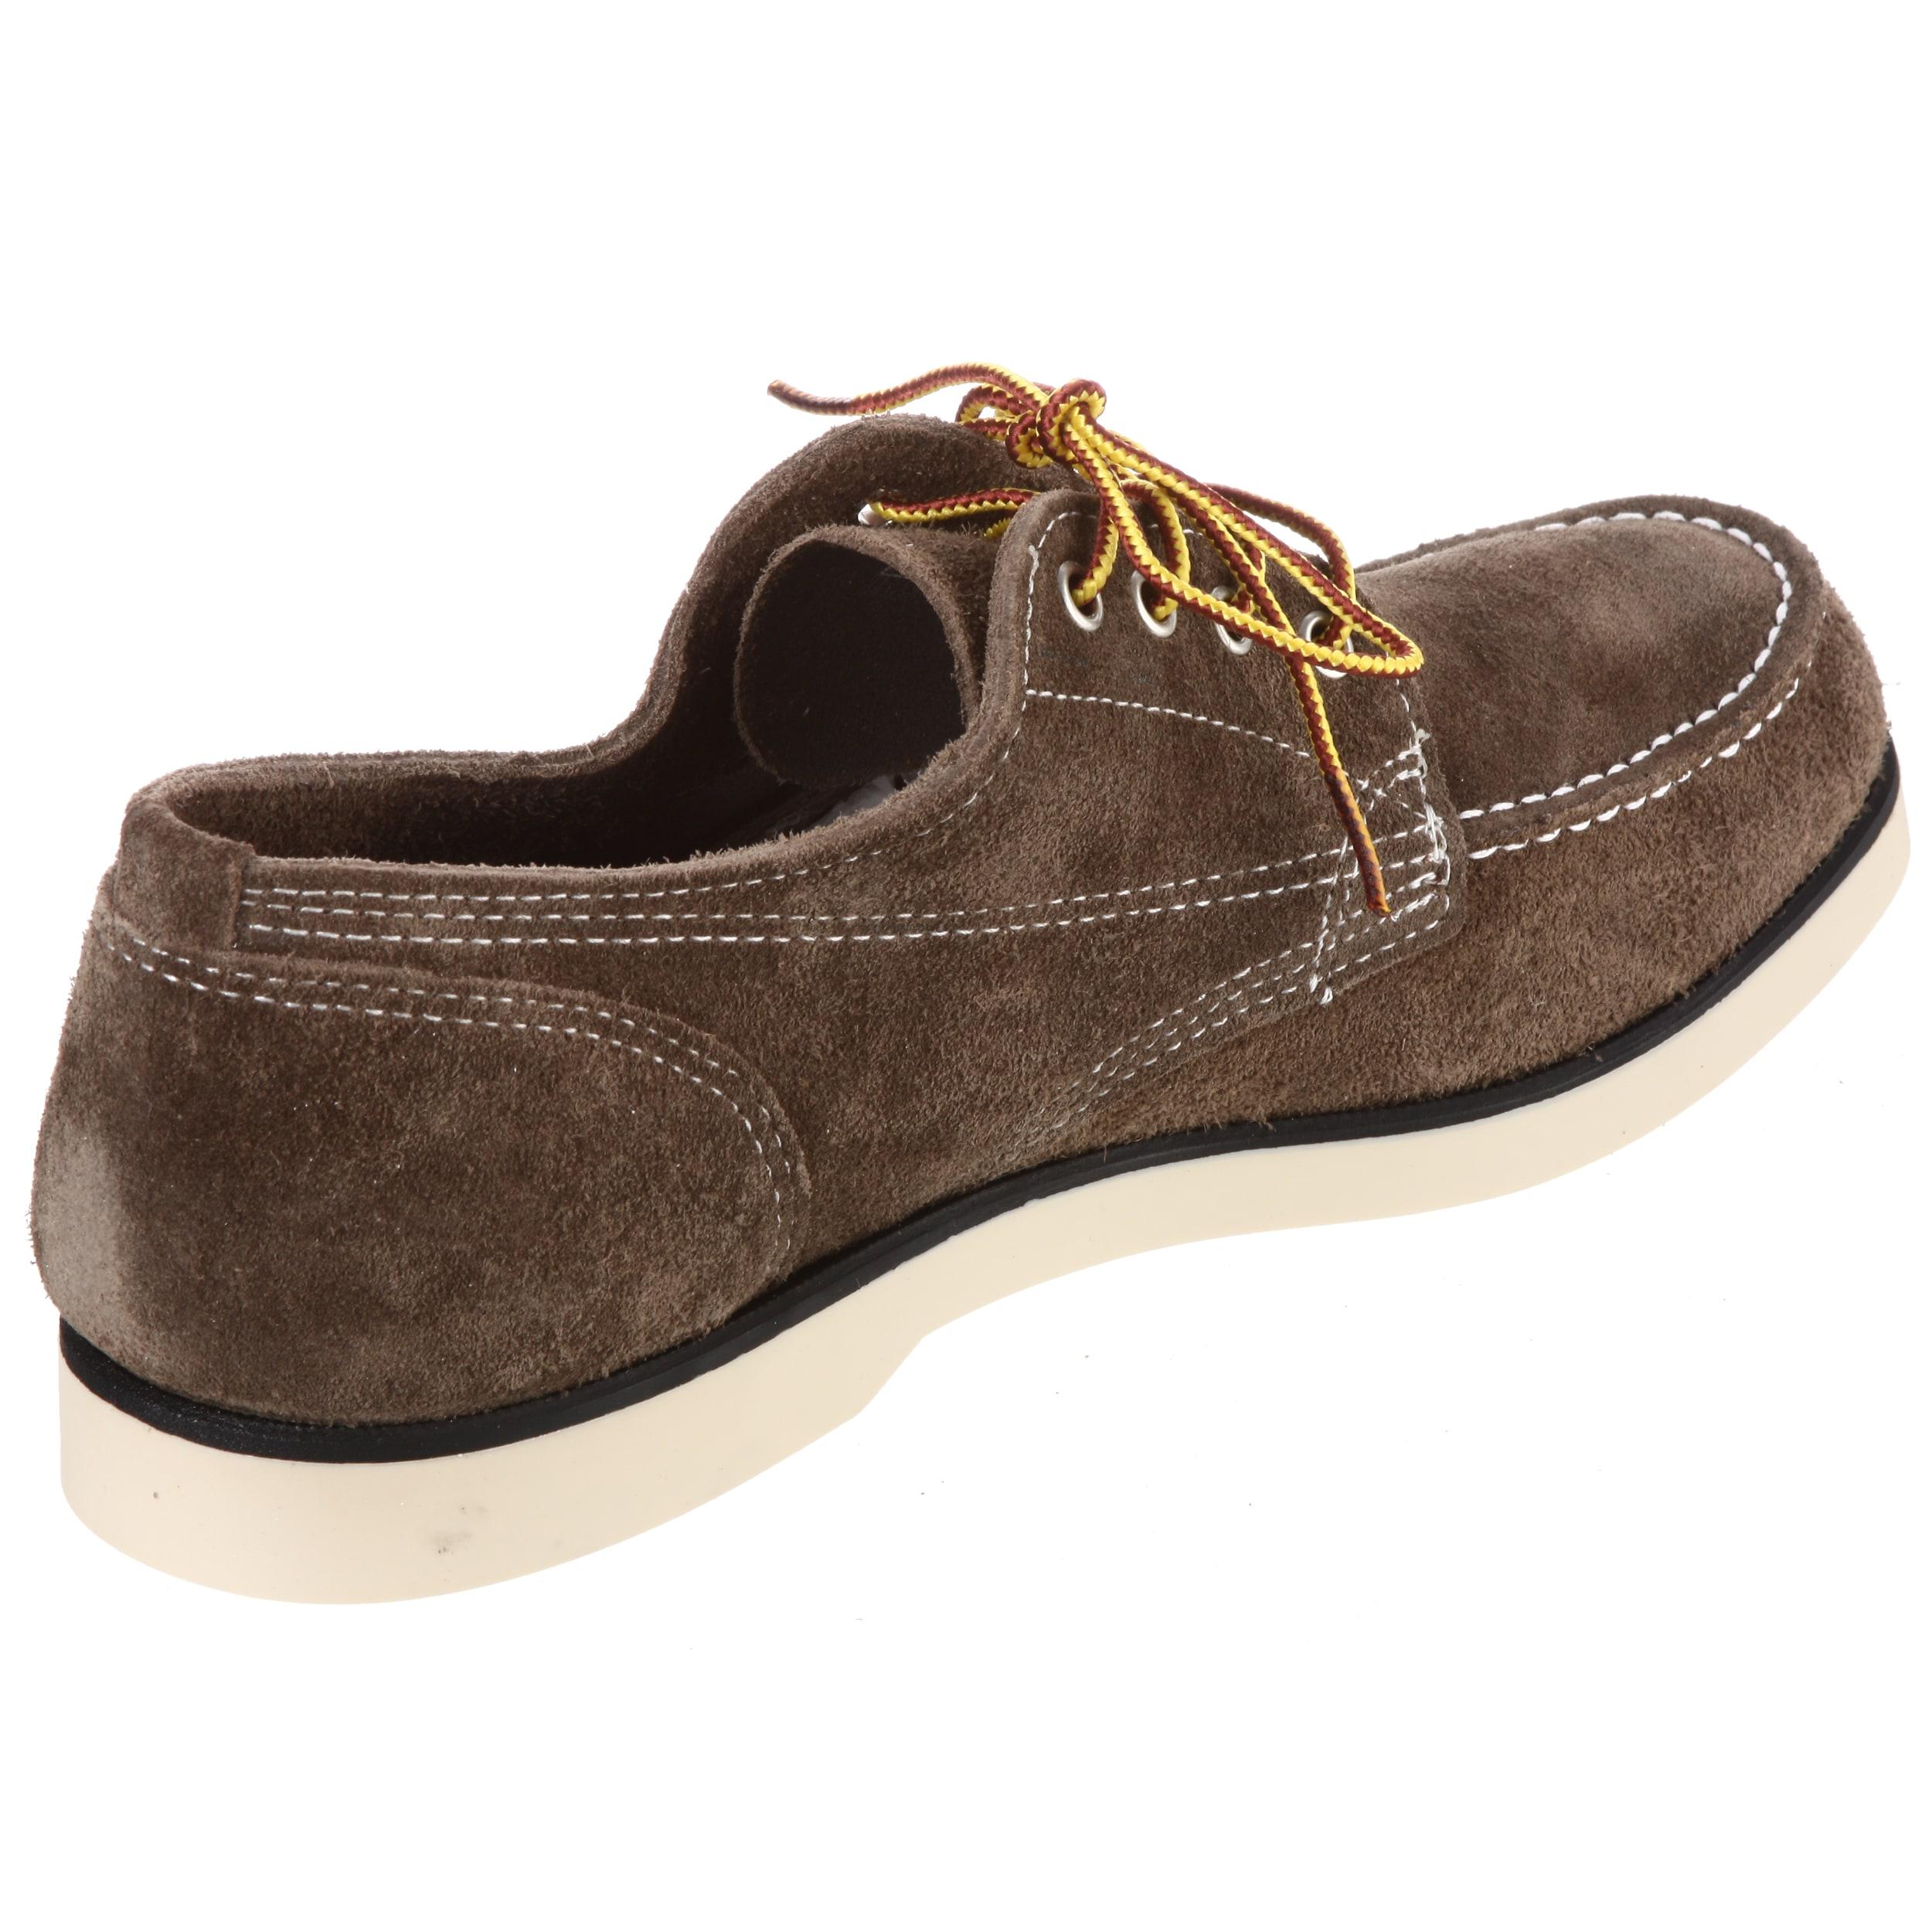 100/% Wool Felt Handmade Embroidery Winter Slippers Booties House Shoes Valenki *